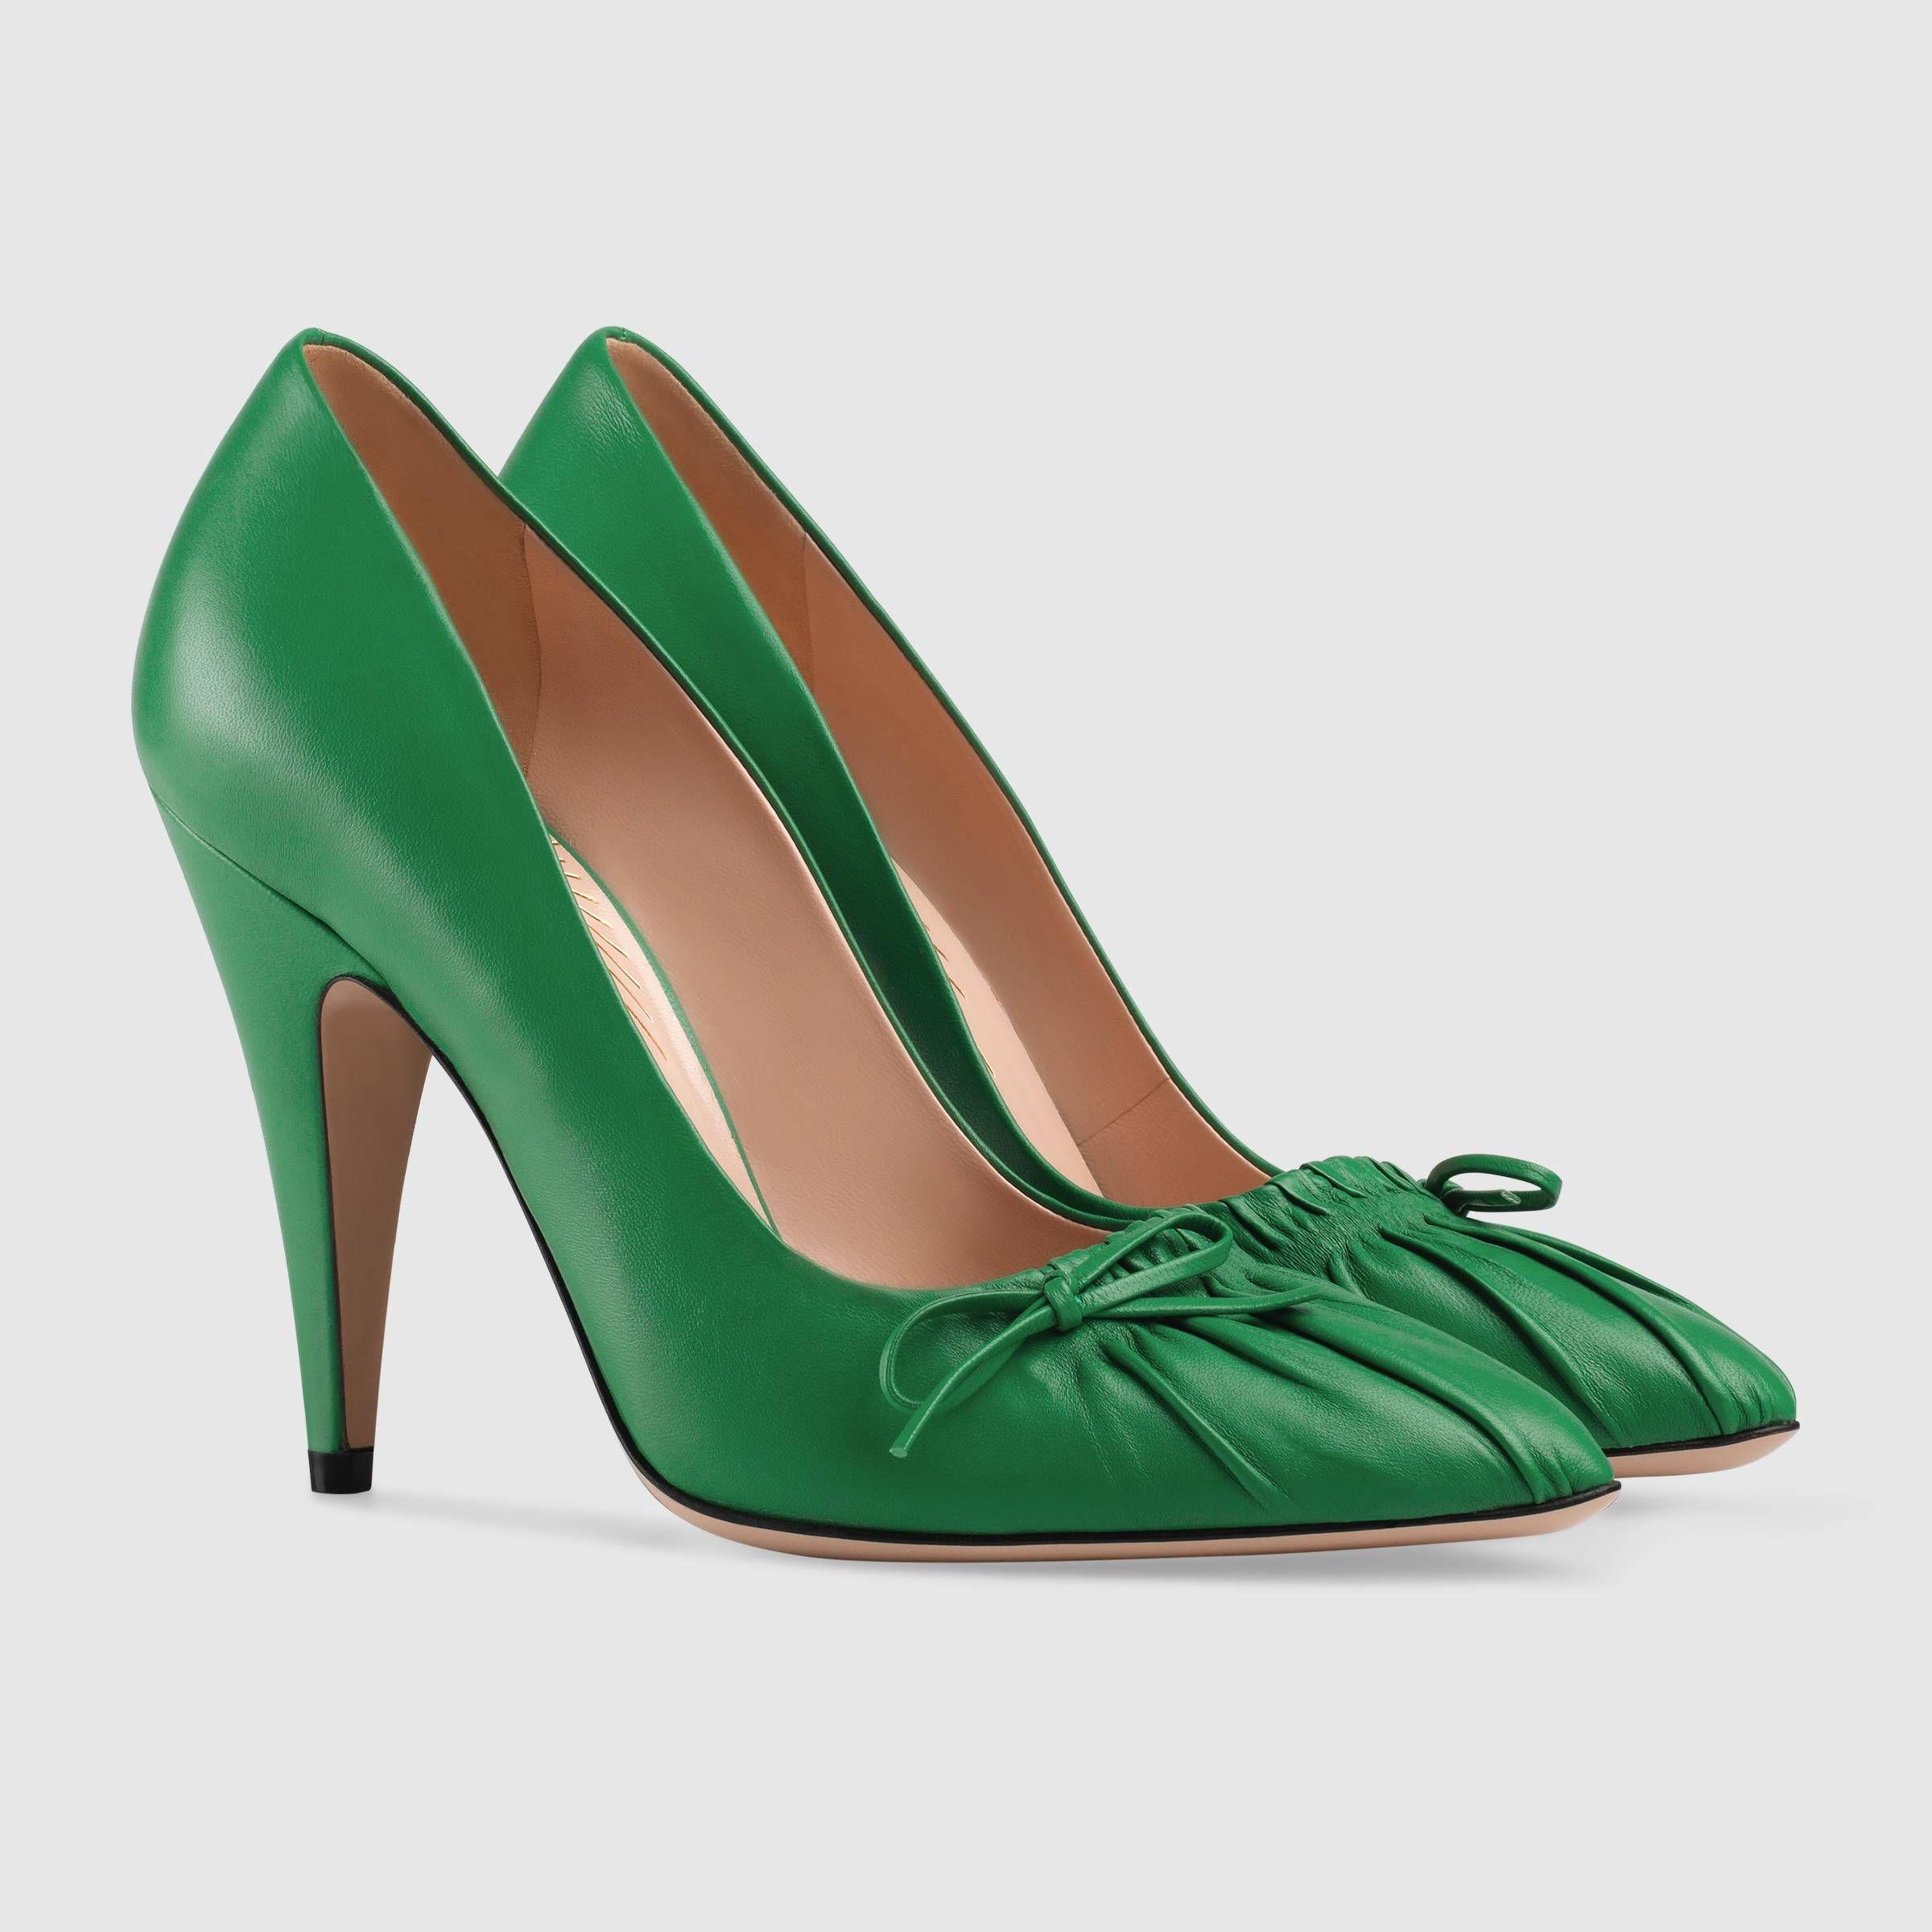 Gucci Women's High Heels Pumps